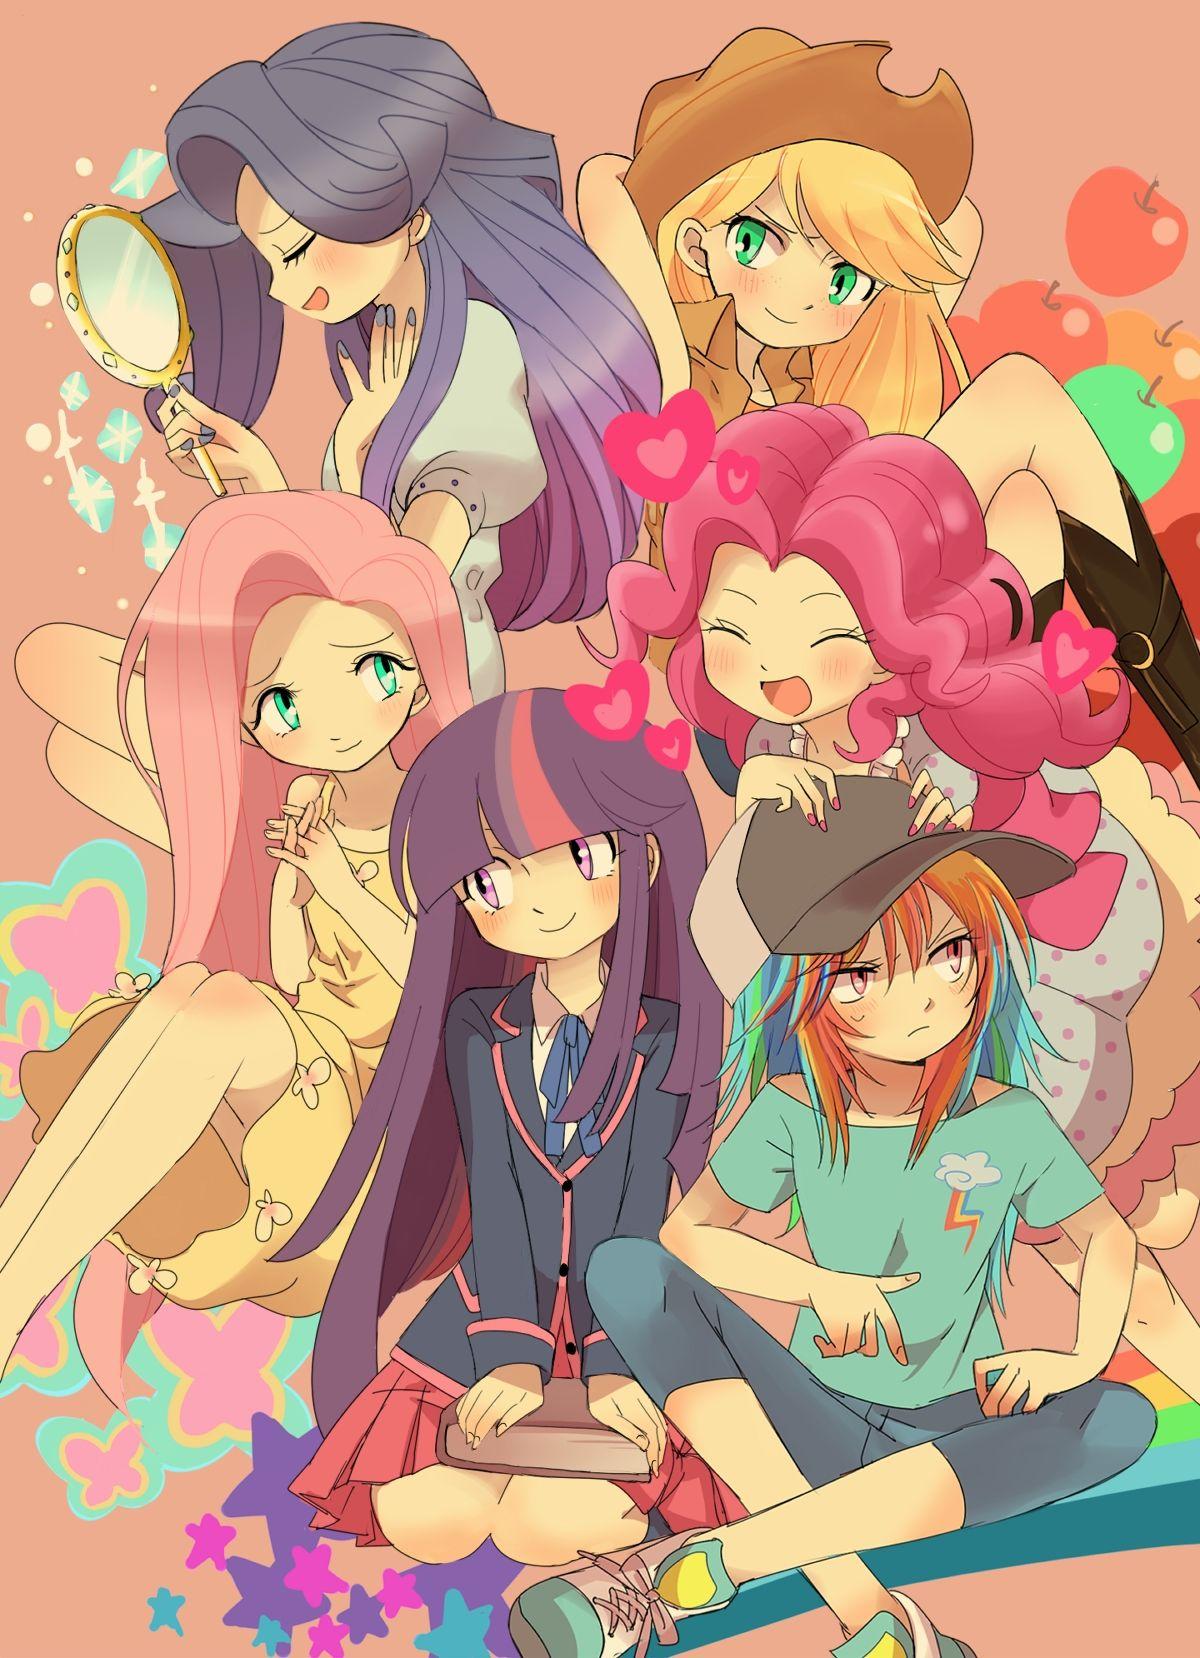 Tags: Fanart, Pixiv, My Little Pony, Twilight Sparkle, Applejack, My ...